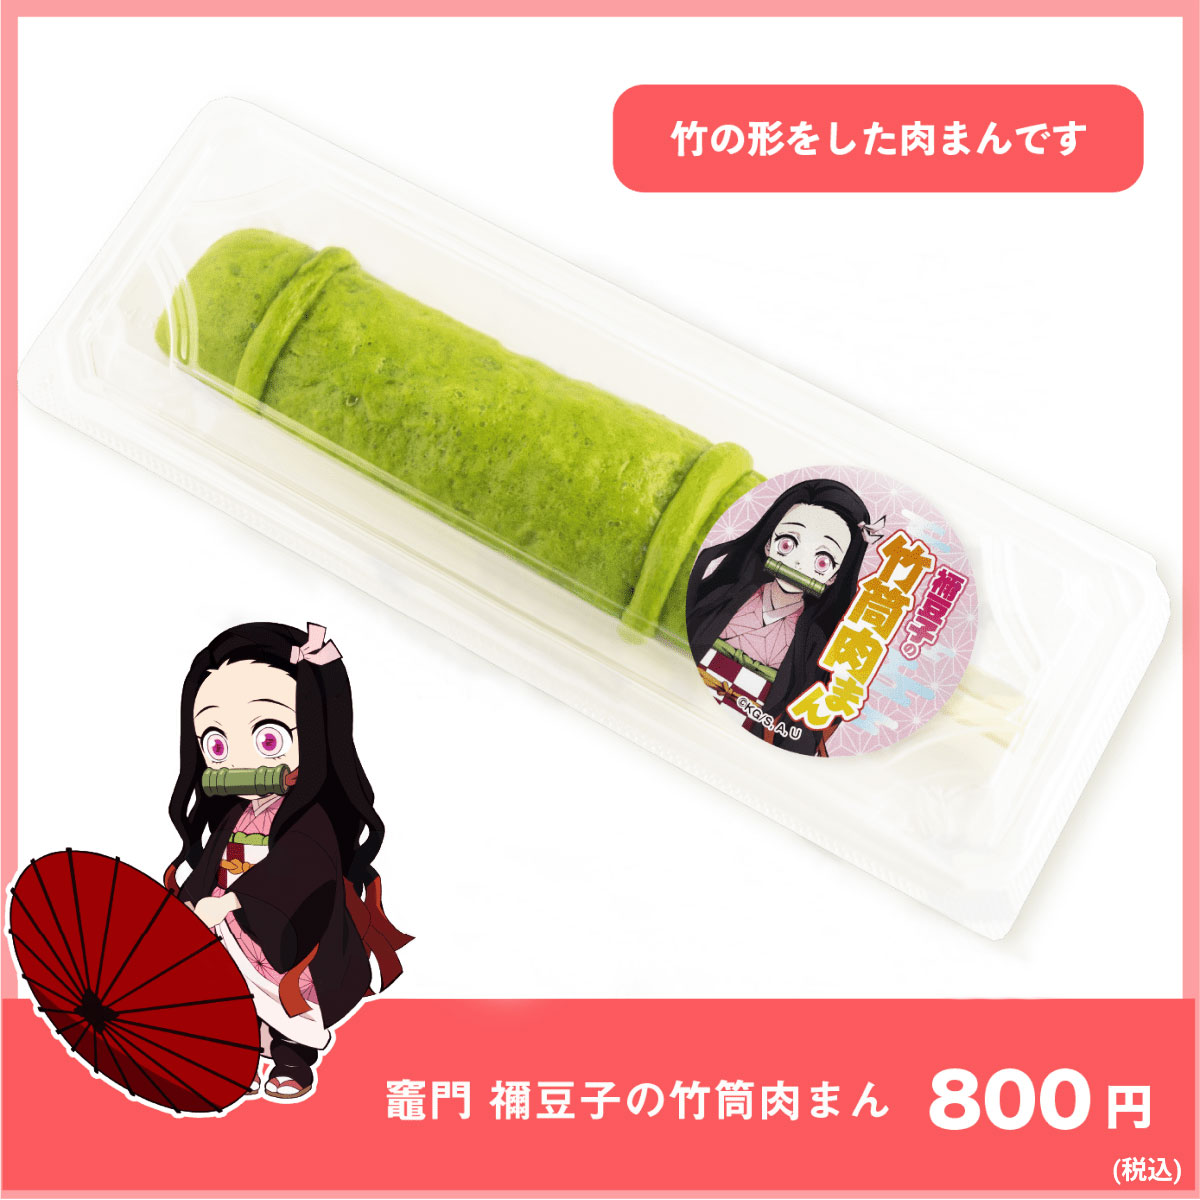 Demon Slayer X Asakusa Nezuko Kamado's Bamboo Tube Meat Roll